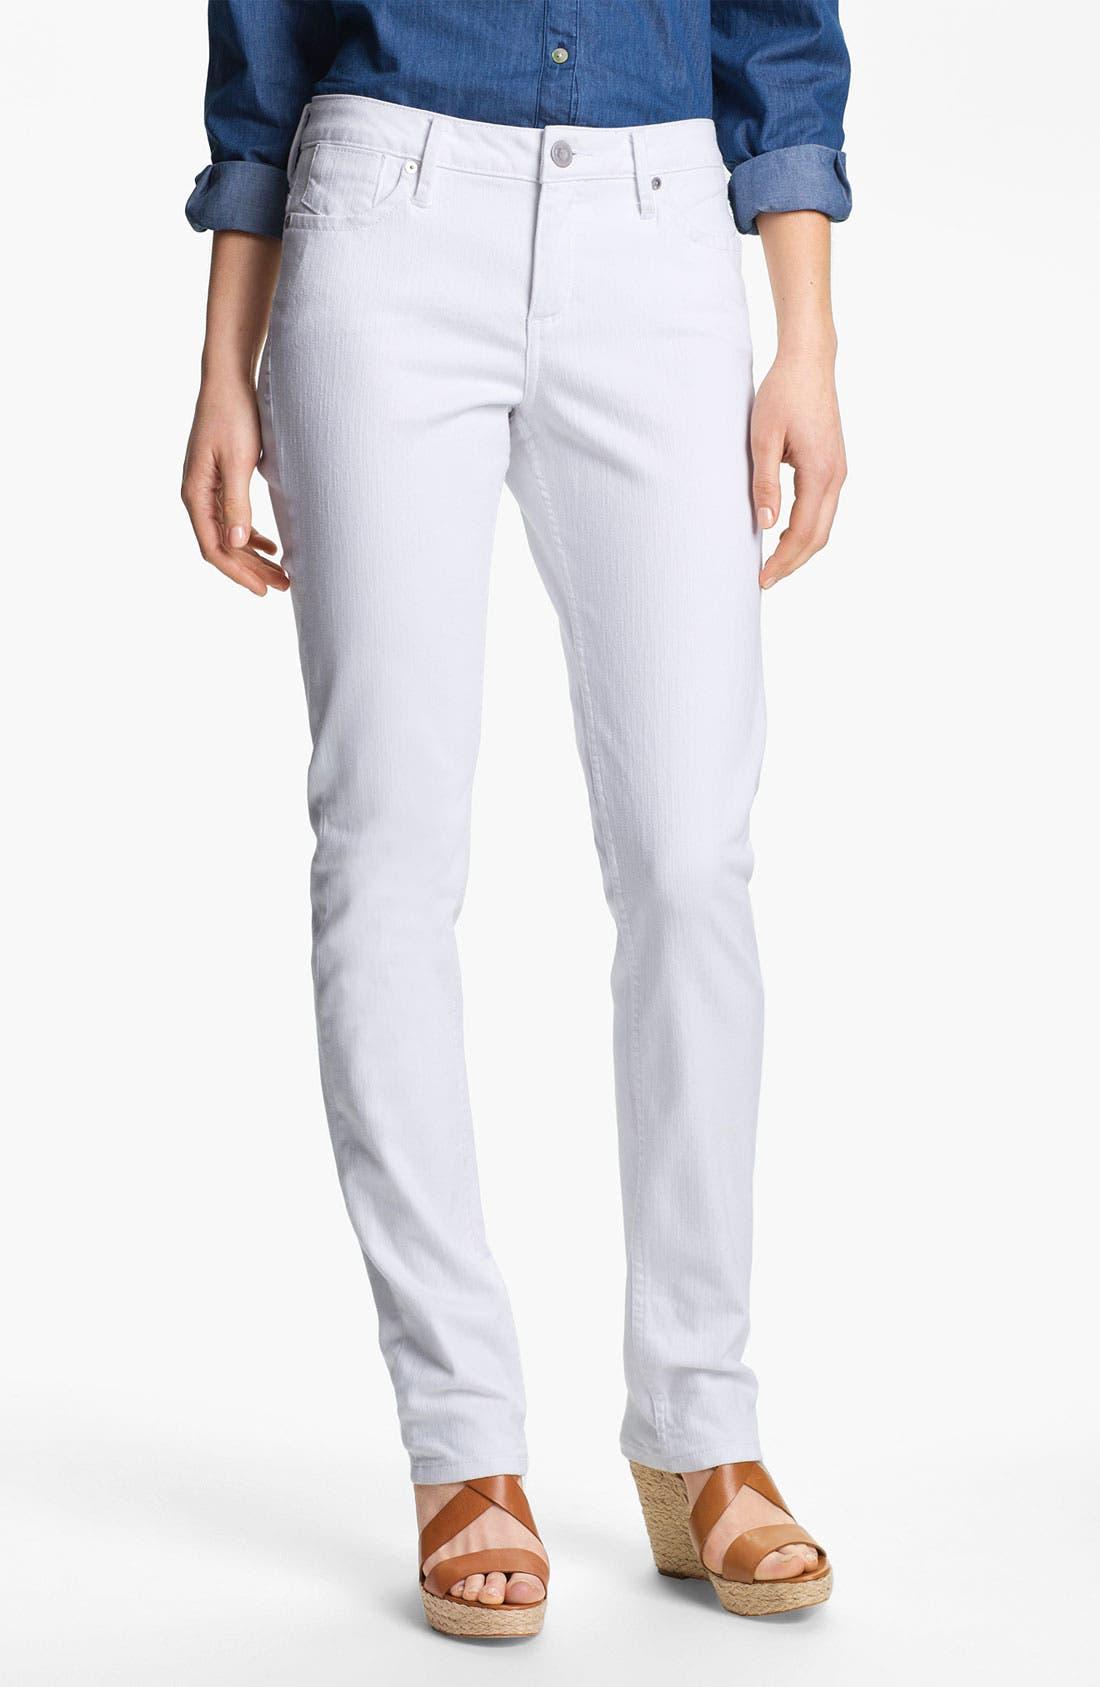 Main Image - Christopher Blue 'Sophia - Silverton' Skinny Jeans